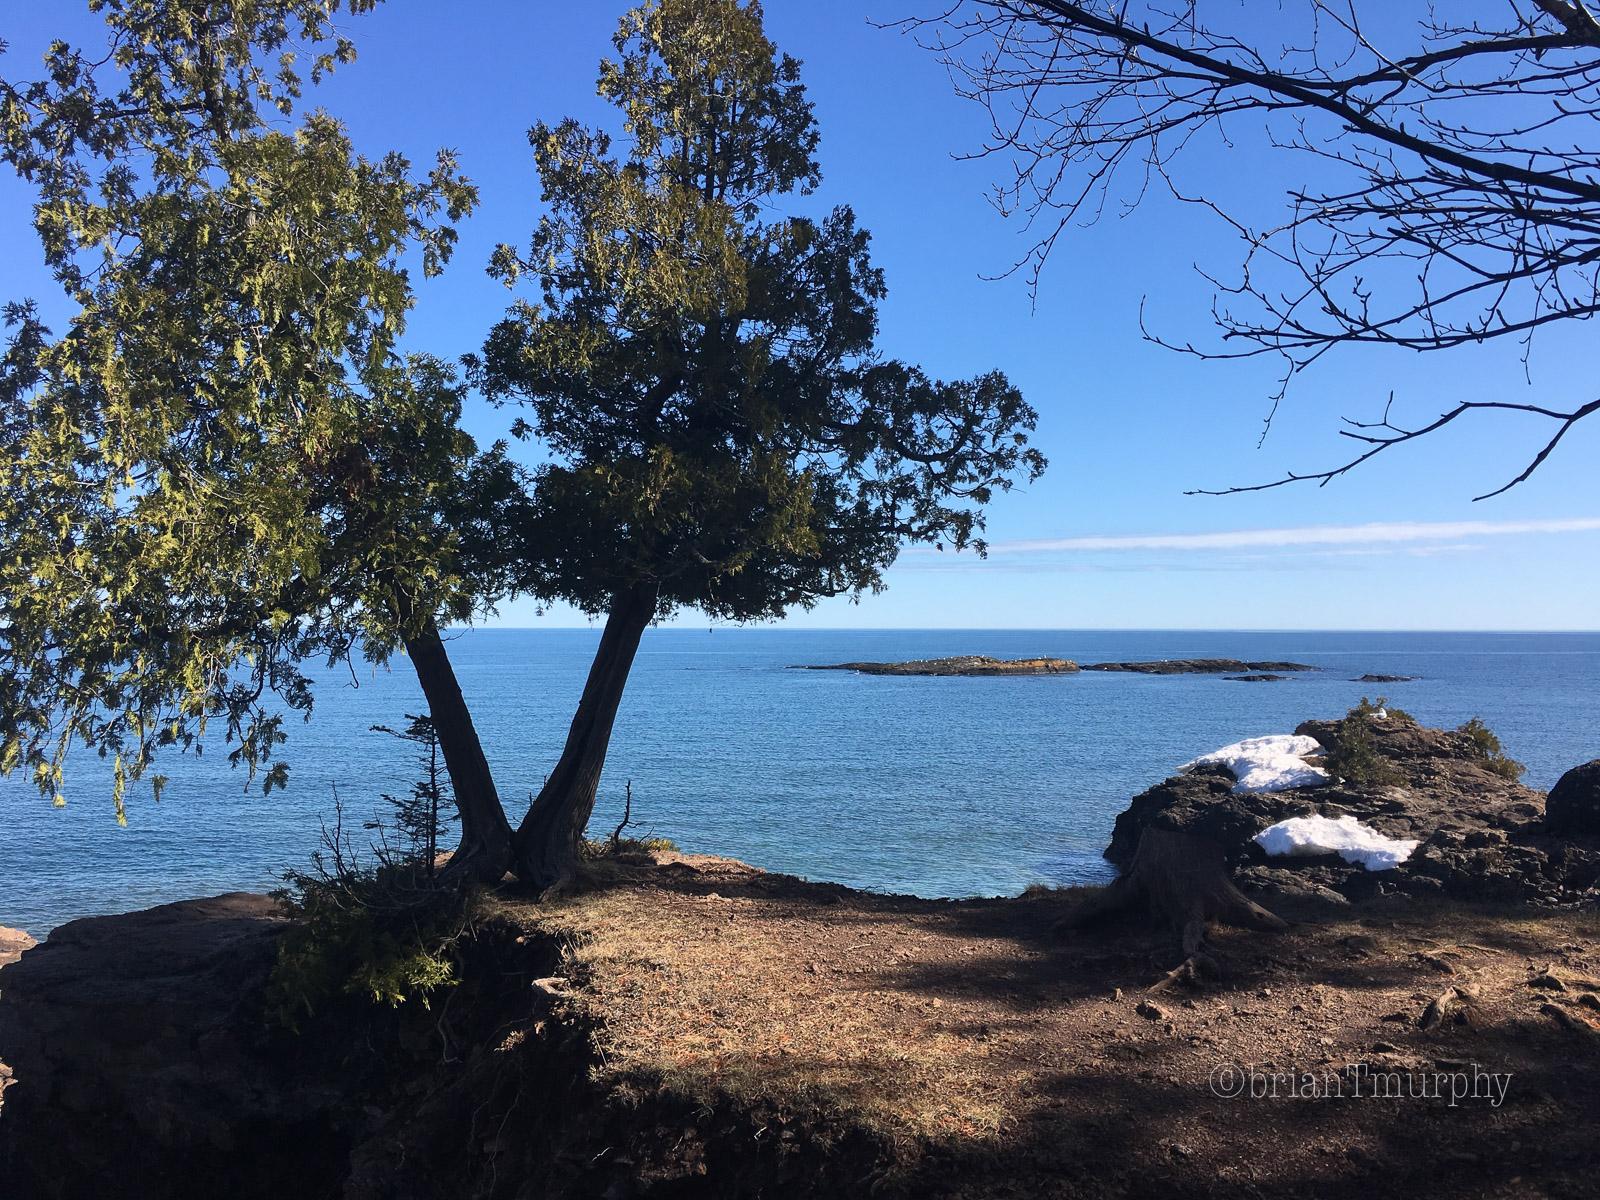 Birding Marquette – The First Week